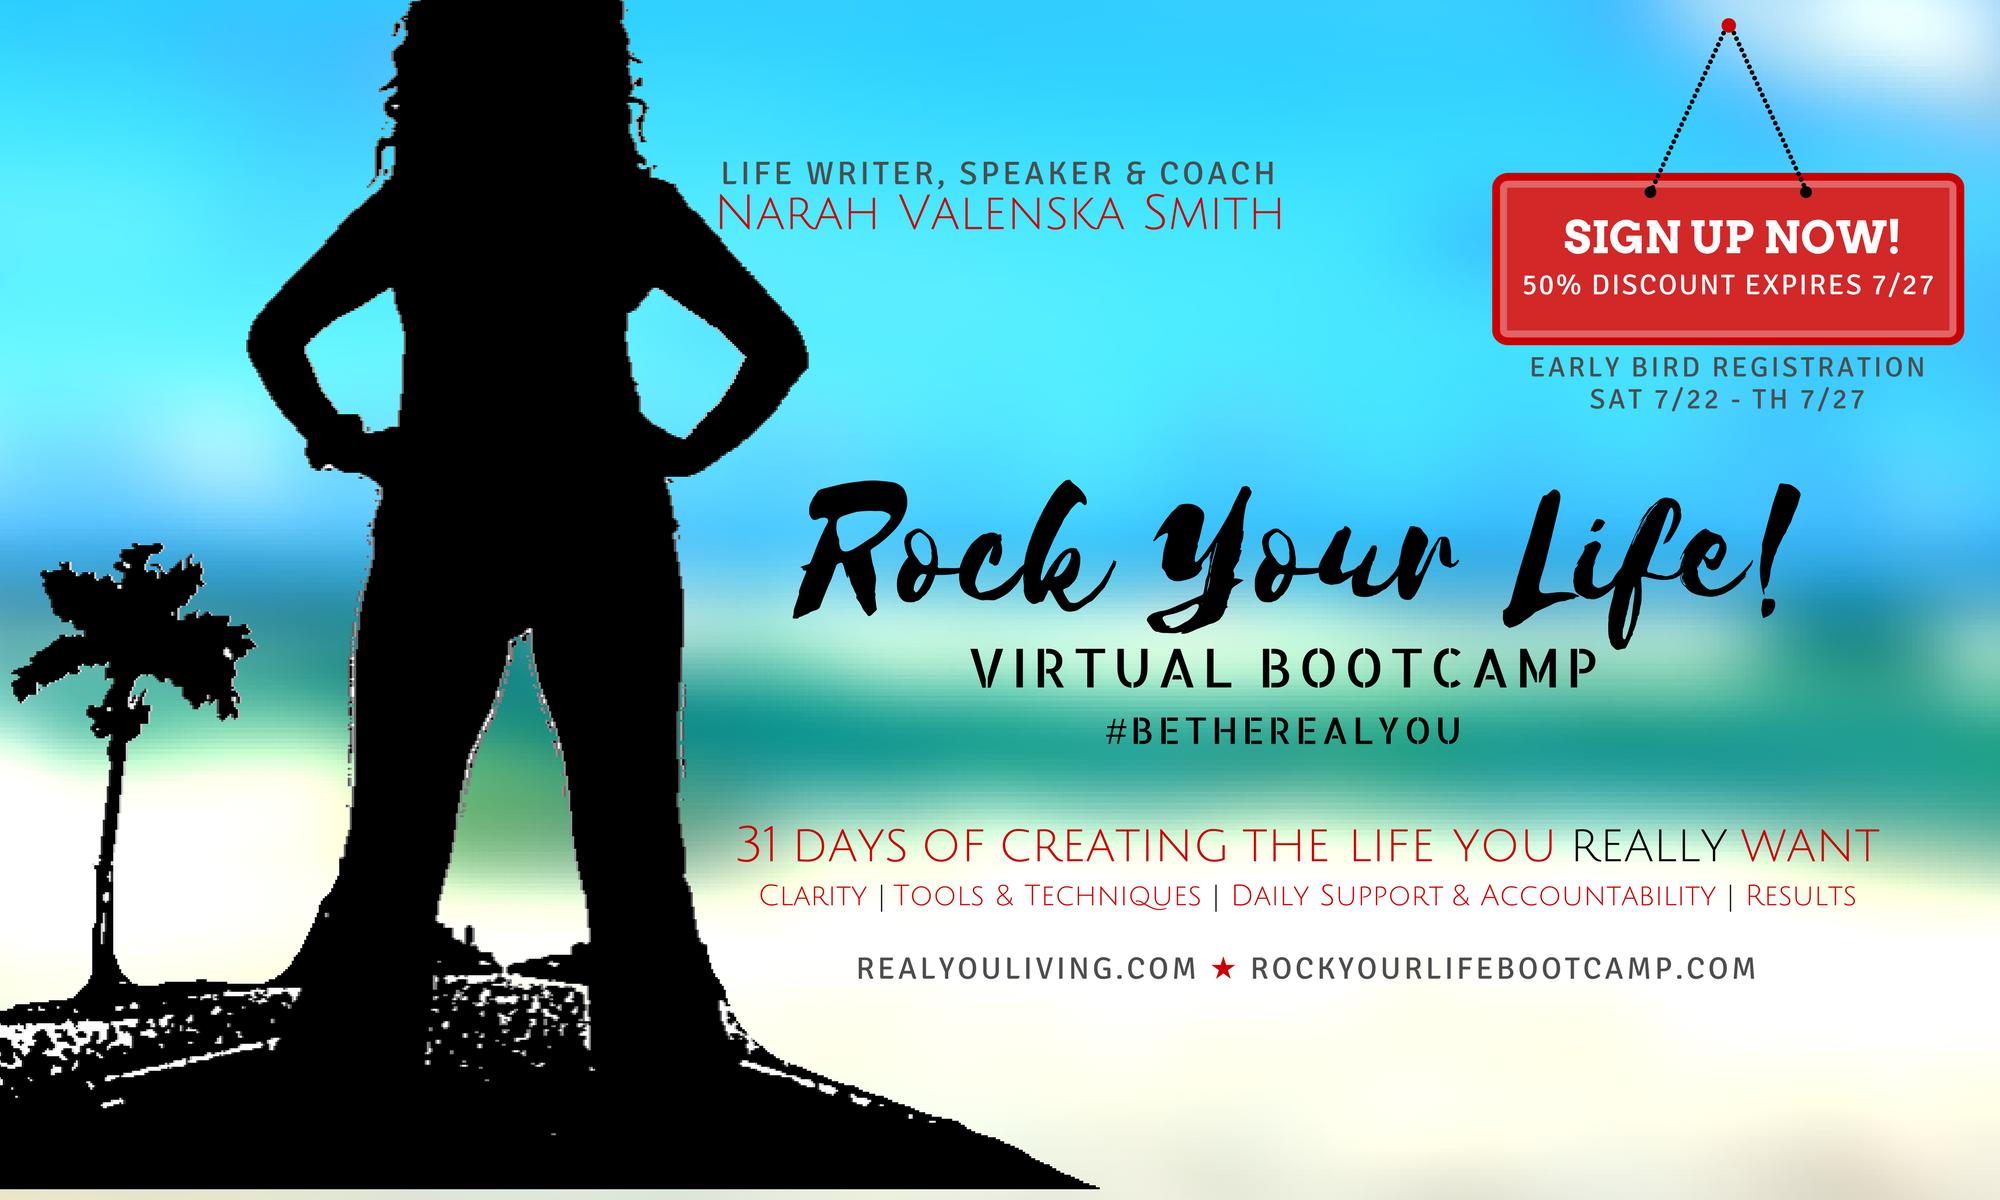 Rock Your Life Virtual Bootcamp